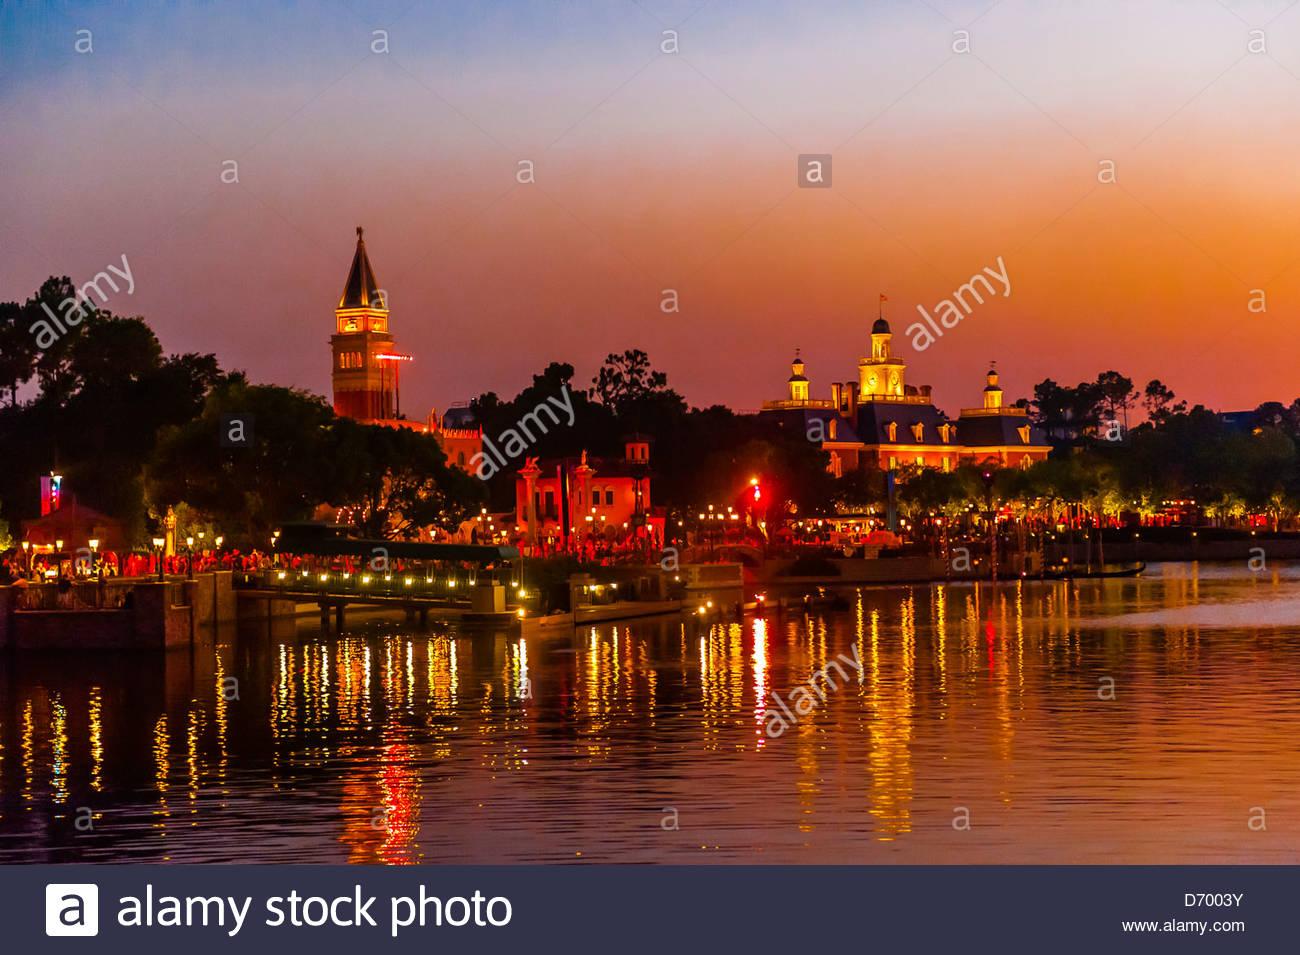 Italien-Pavillon und die American Adventure World Showcase, Epcot, Walt Disney World, Orlando, Florida USA Stockbild